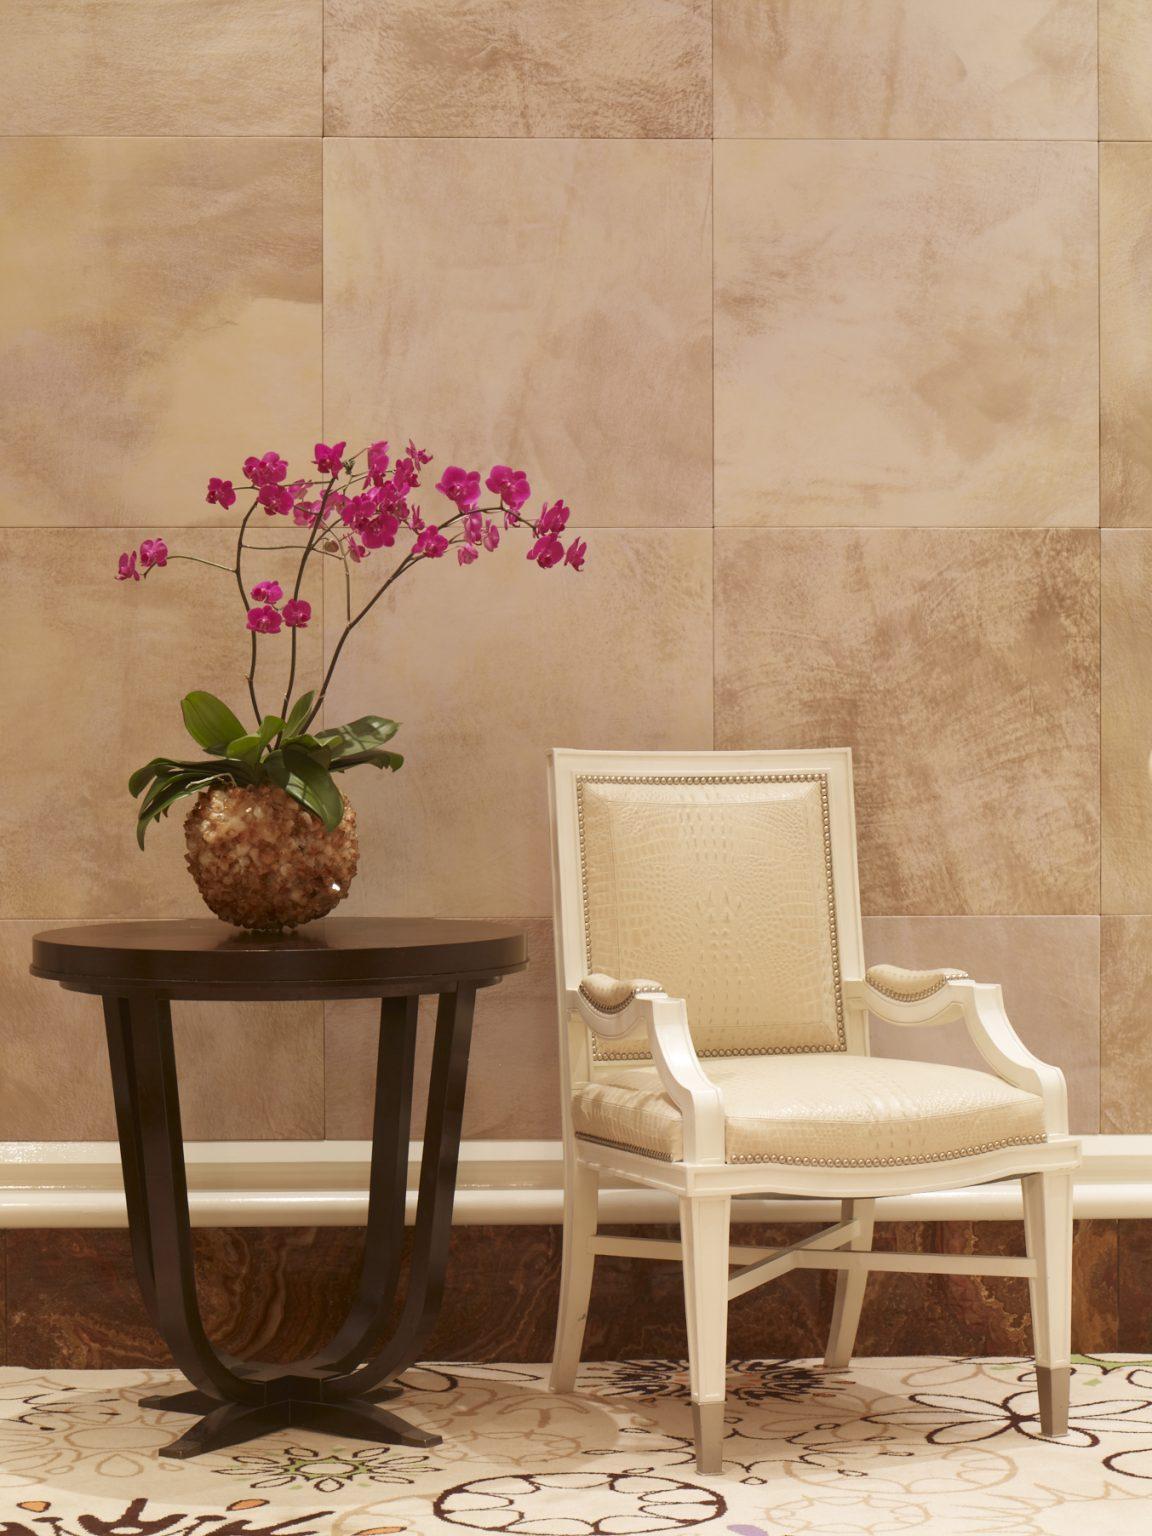 Wynn casino baccarat room tlc rtc faux parchment tiles 1 for Wynn design and development las vegas